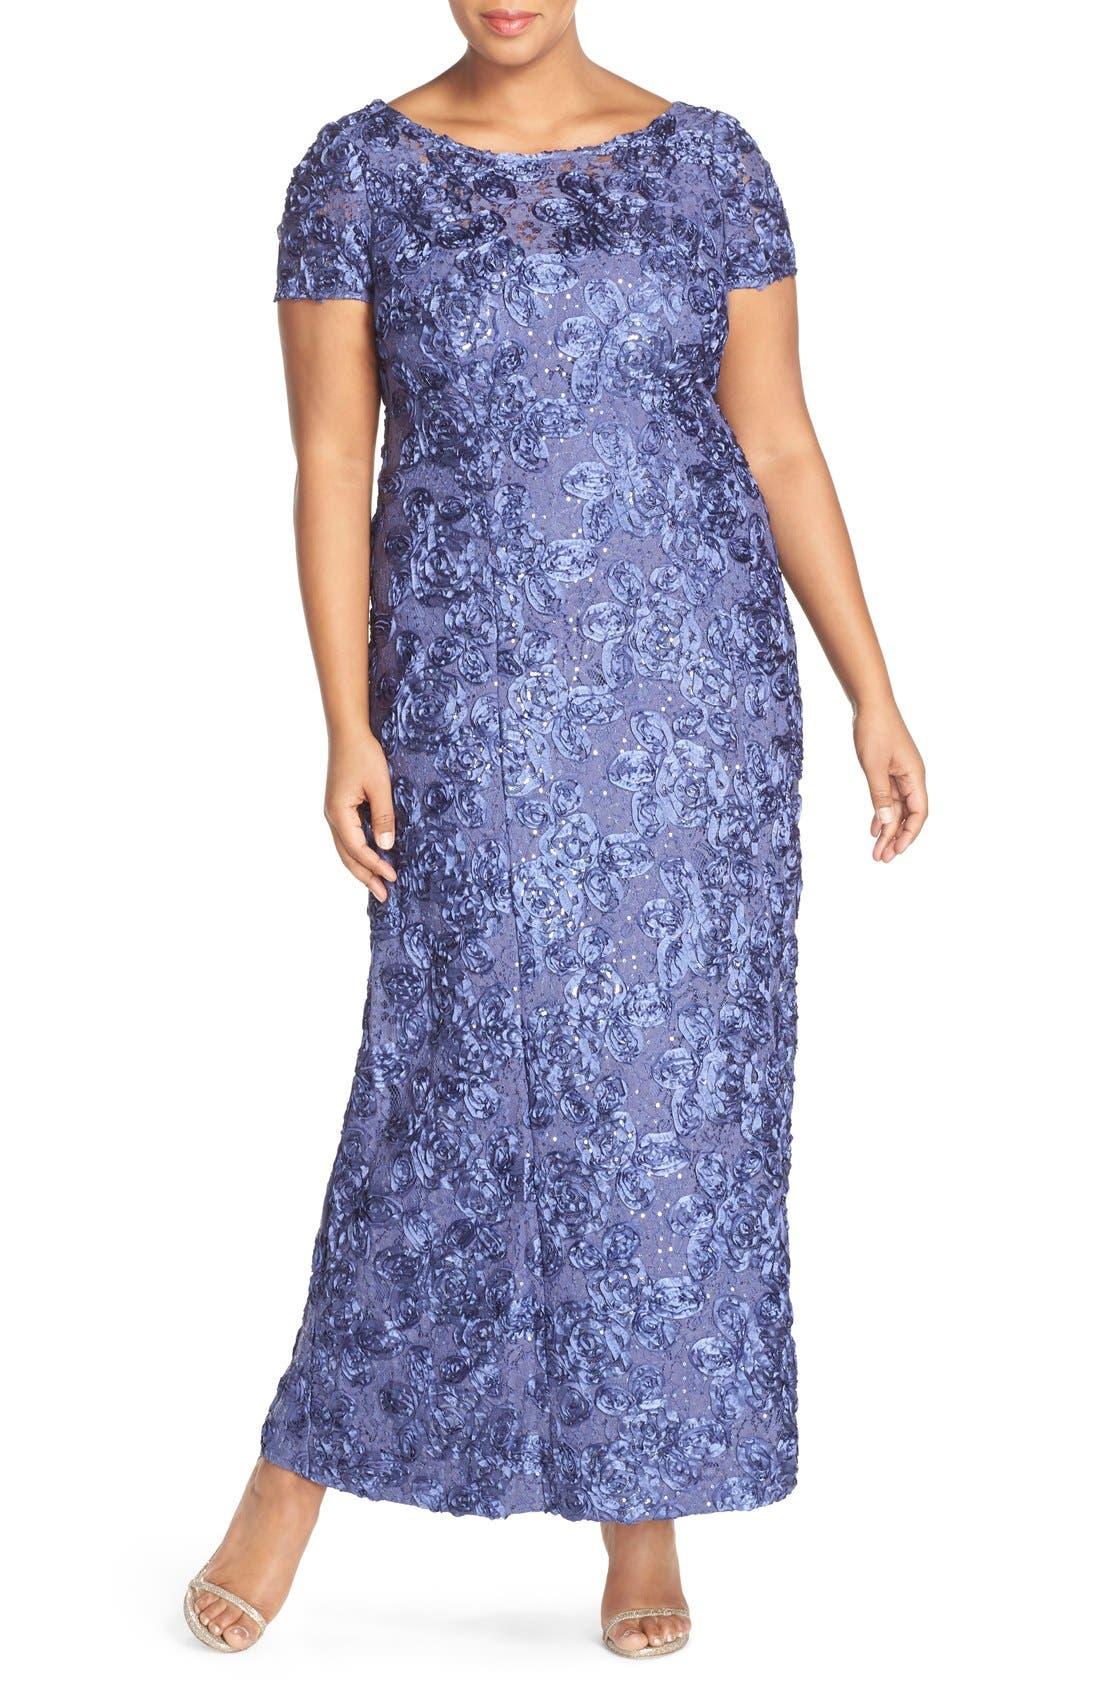 Alternate Image 1 Selected - Alex Evenings Rosette Lace Short Sleeve A-Line Gown (PlusSize)